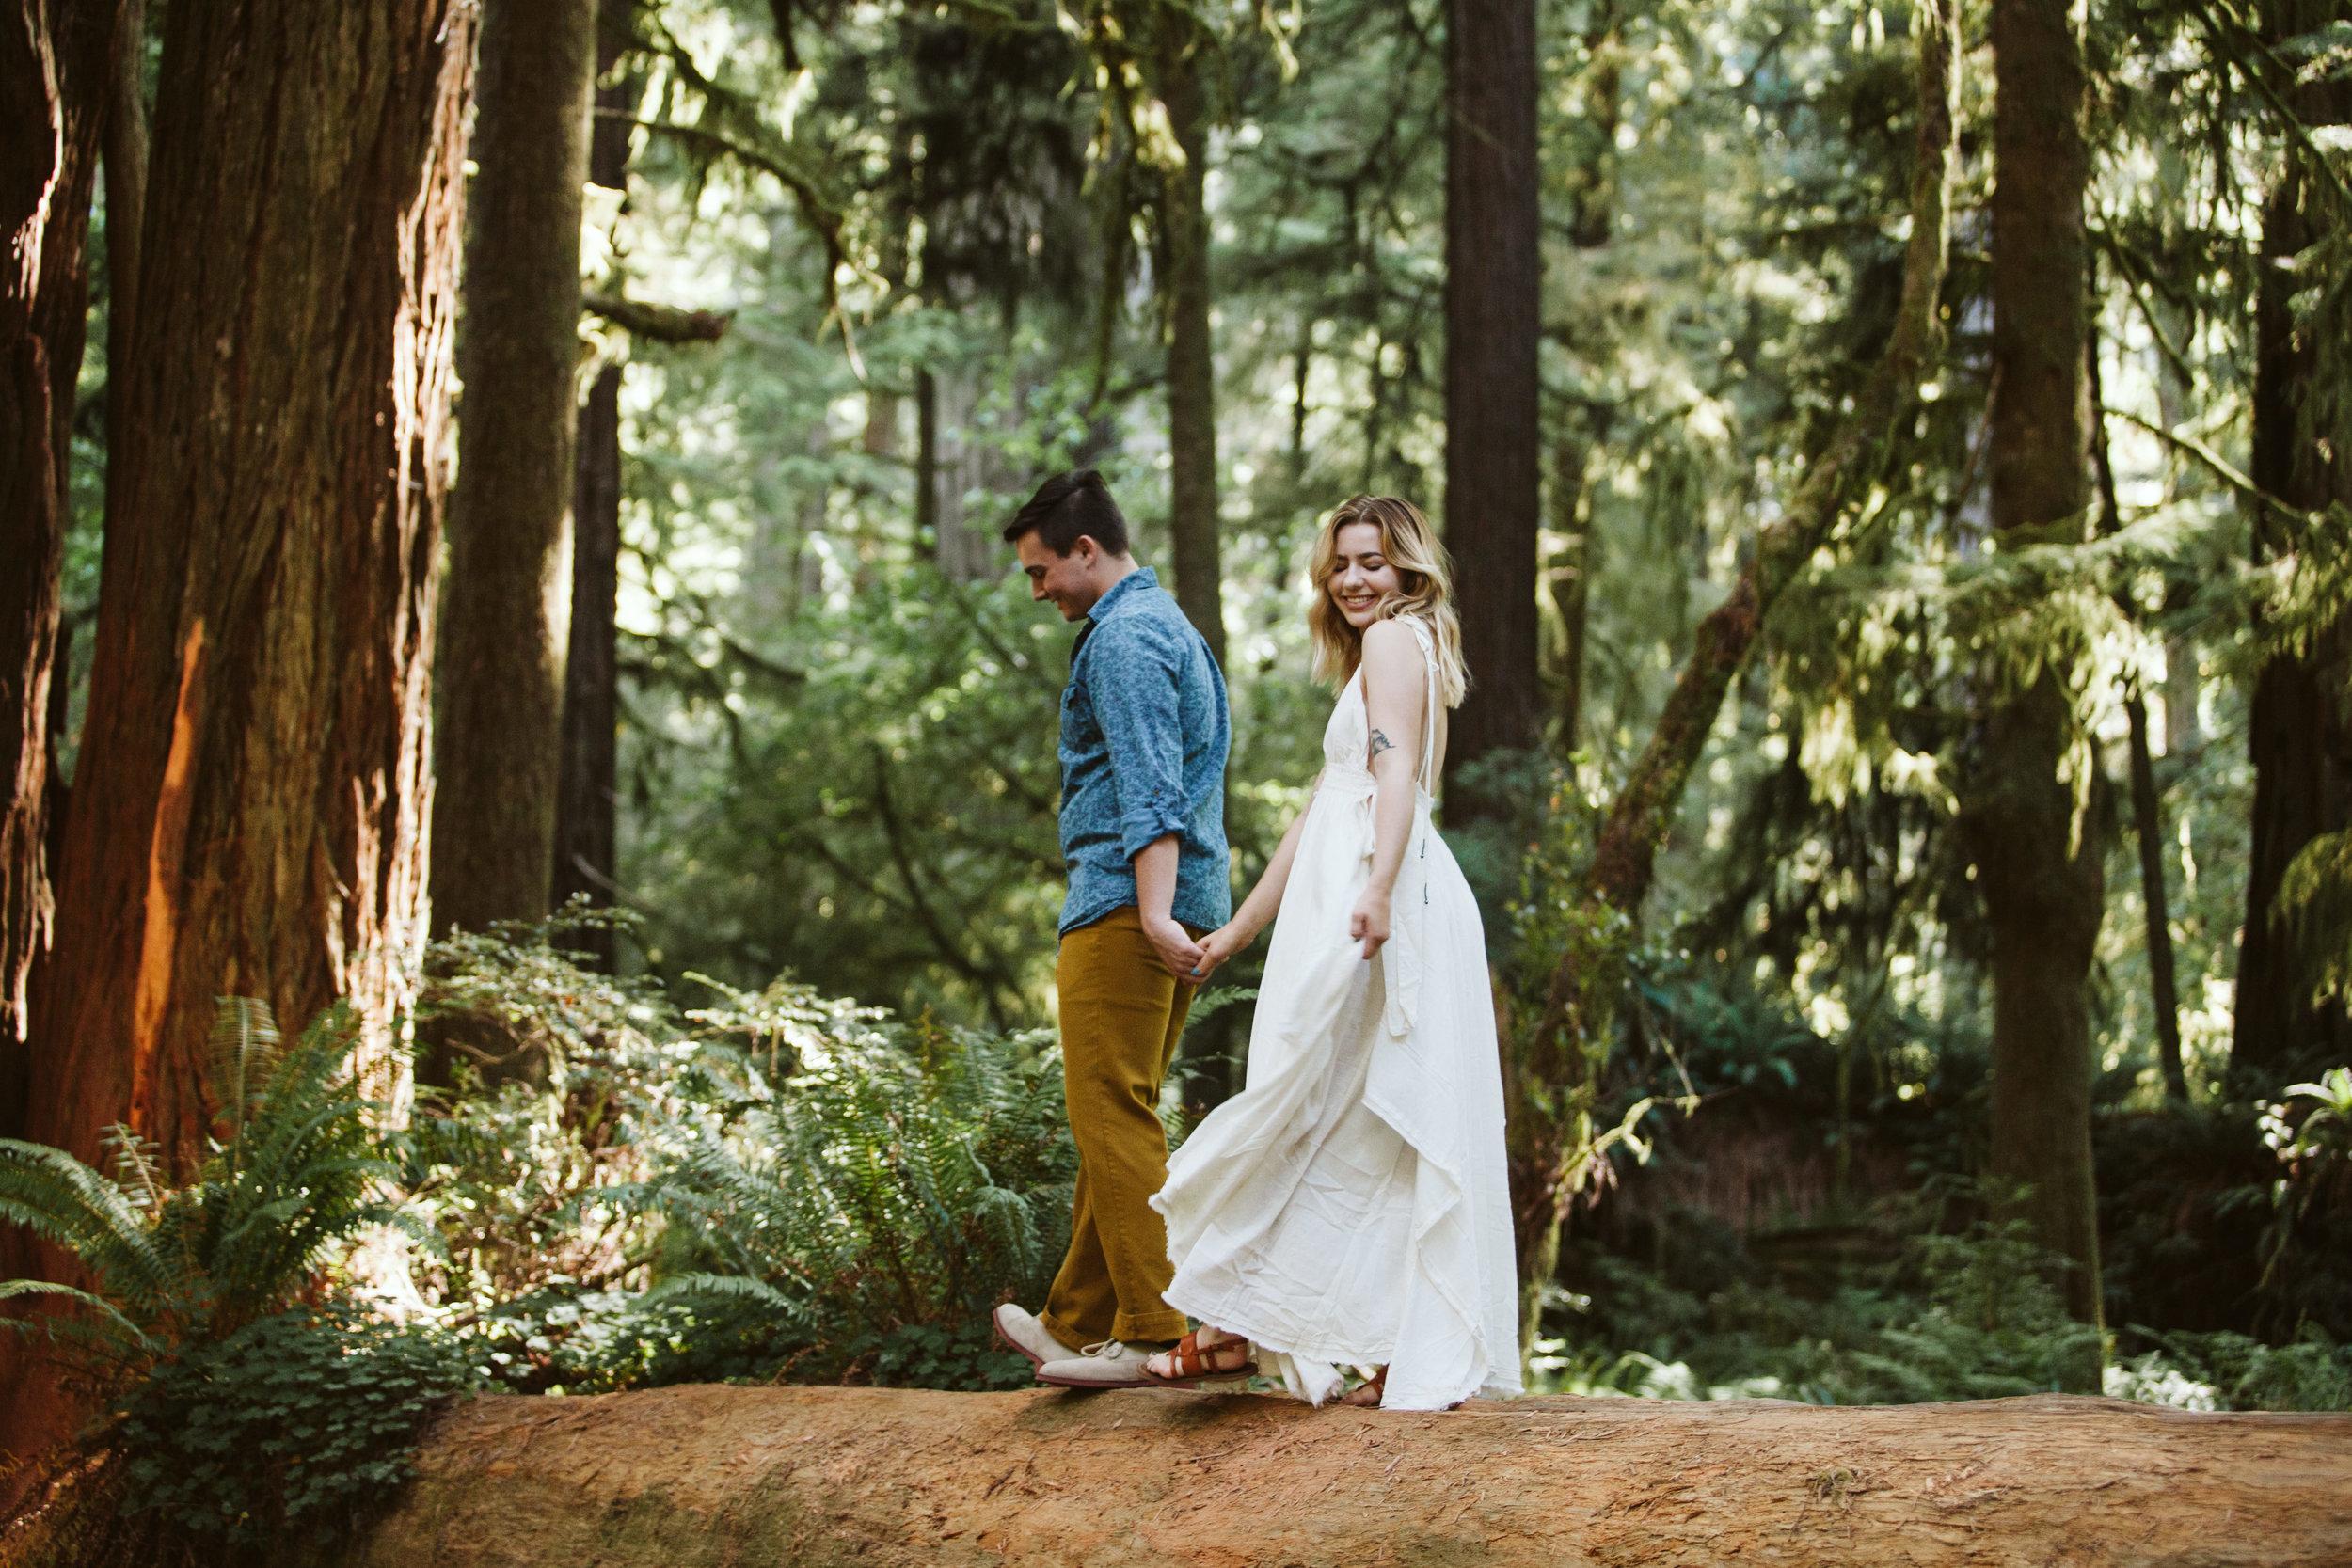 Hannah&Ben_Redwoods_Elopement_Engagement_PNW_SouthernOregon_NorthernCalifornia_ (9 of 23).jpg